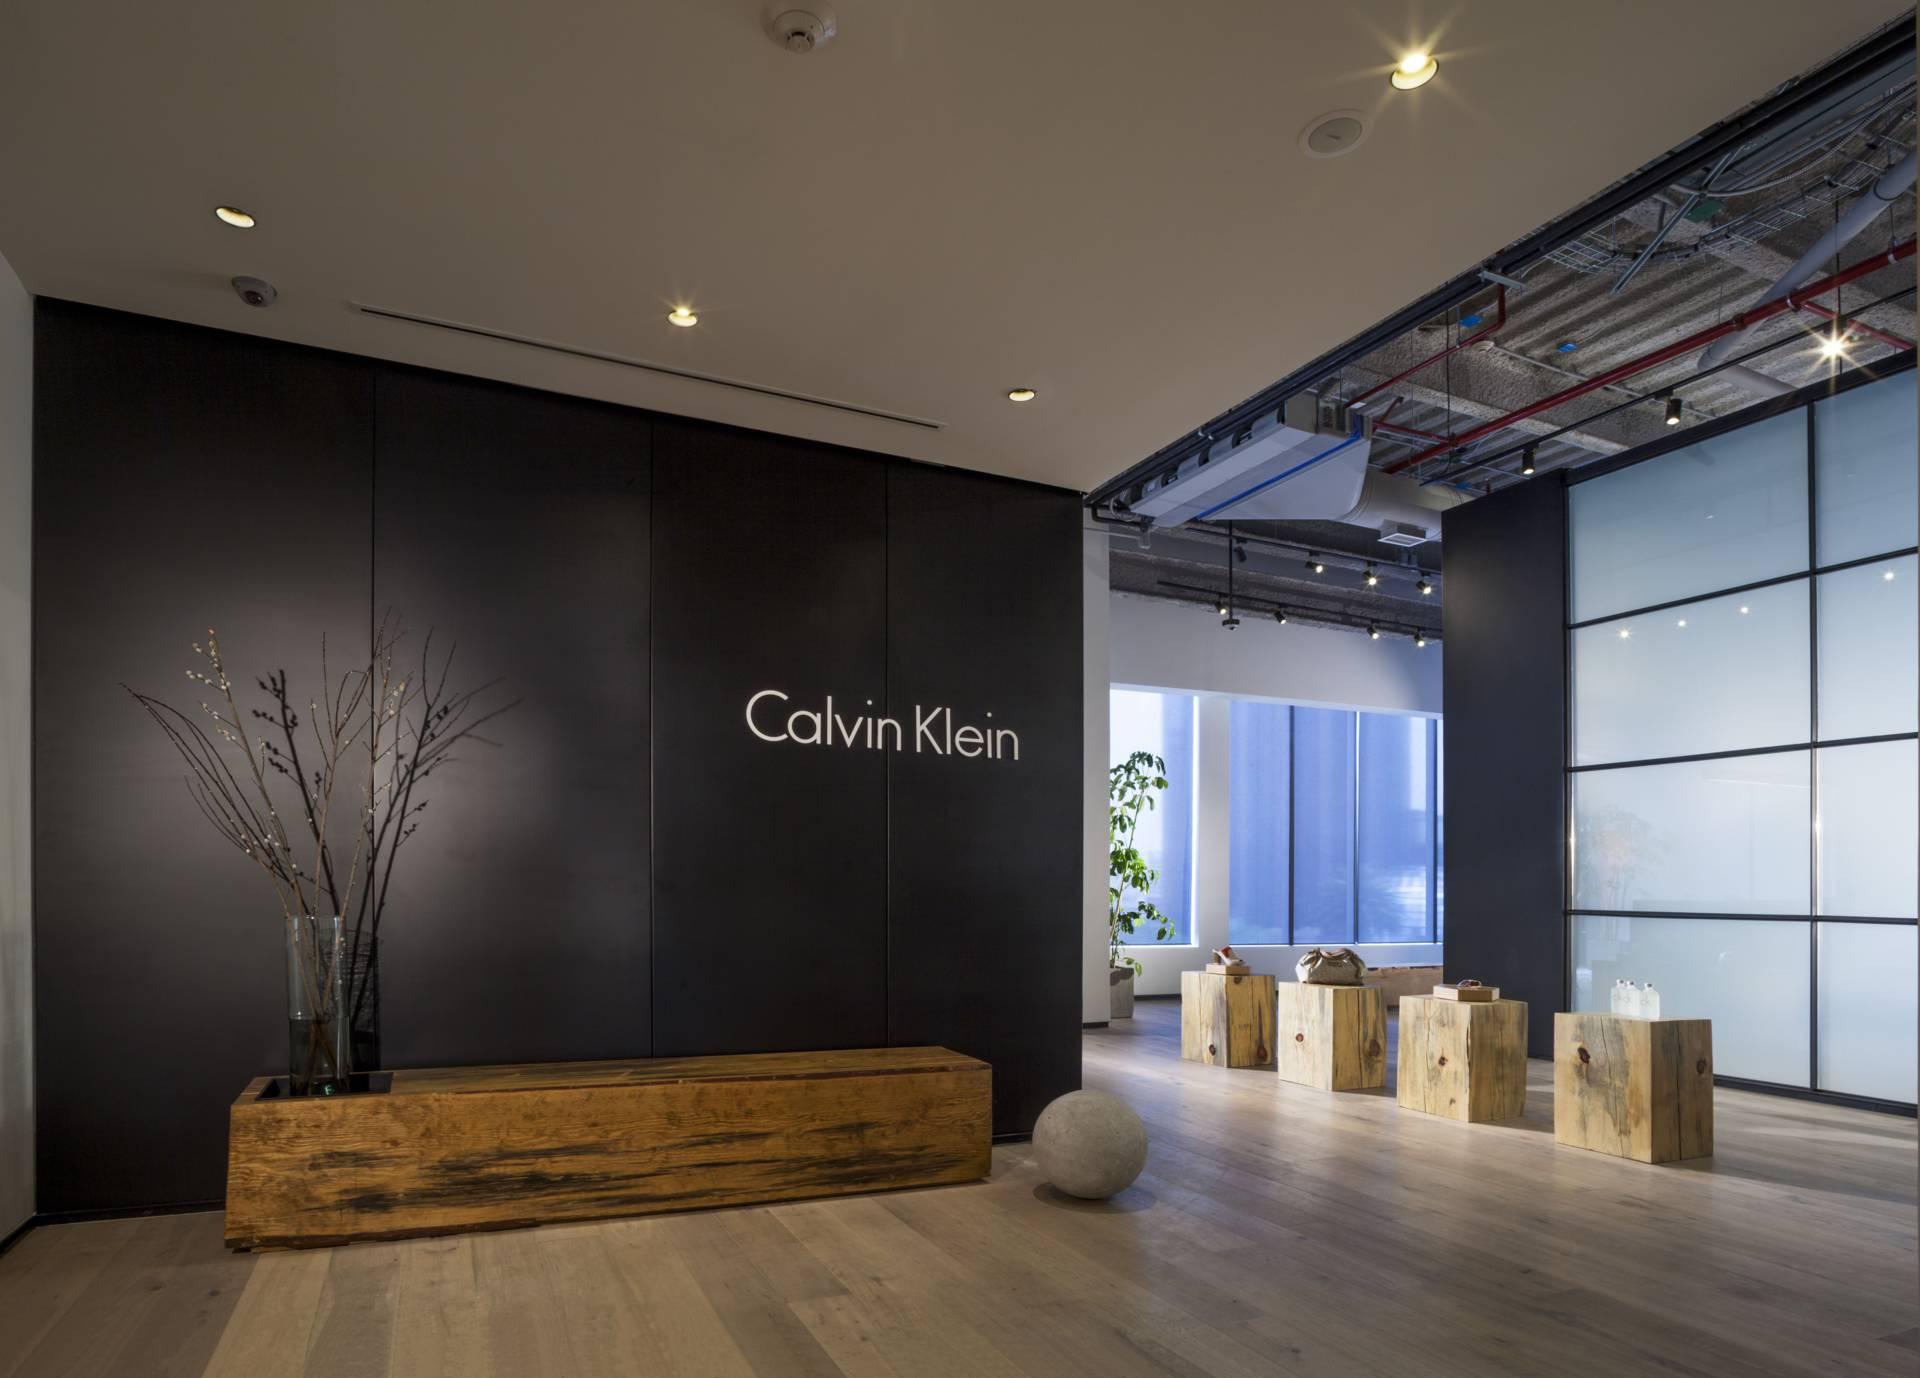 Calvin Klein - PVH Showroom 13